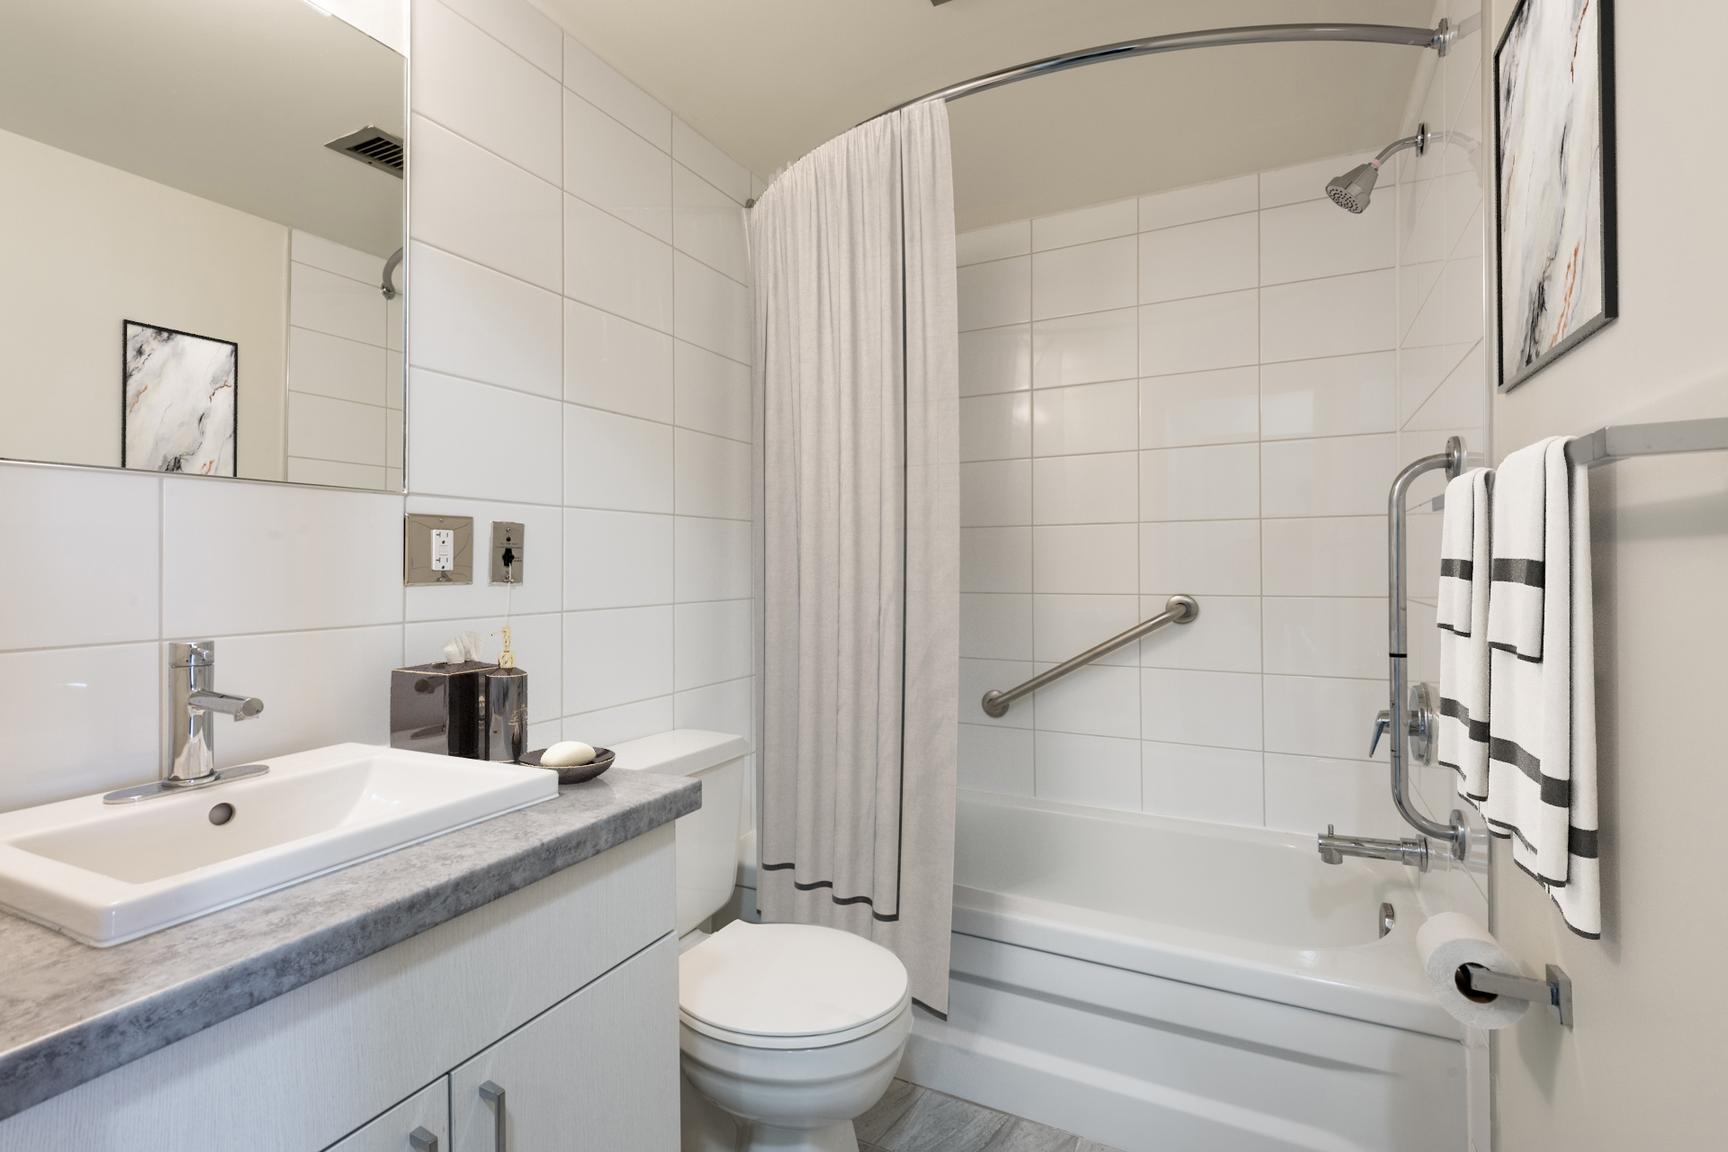 1 bedroom Apartments for rent in Laval at Le Quatre Cent - Photo 16 - RentQuebecApartments – L407184